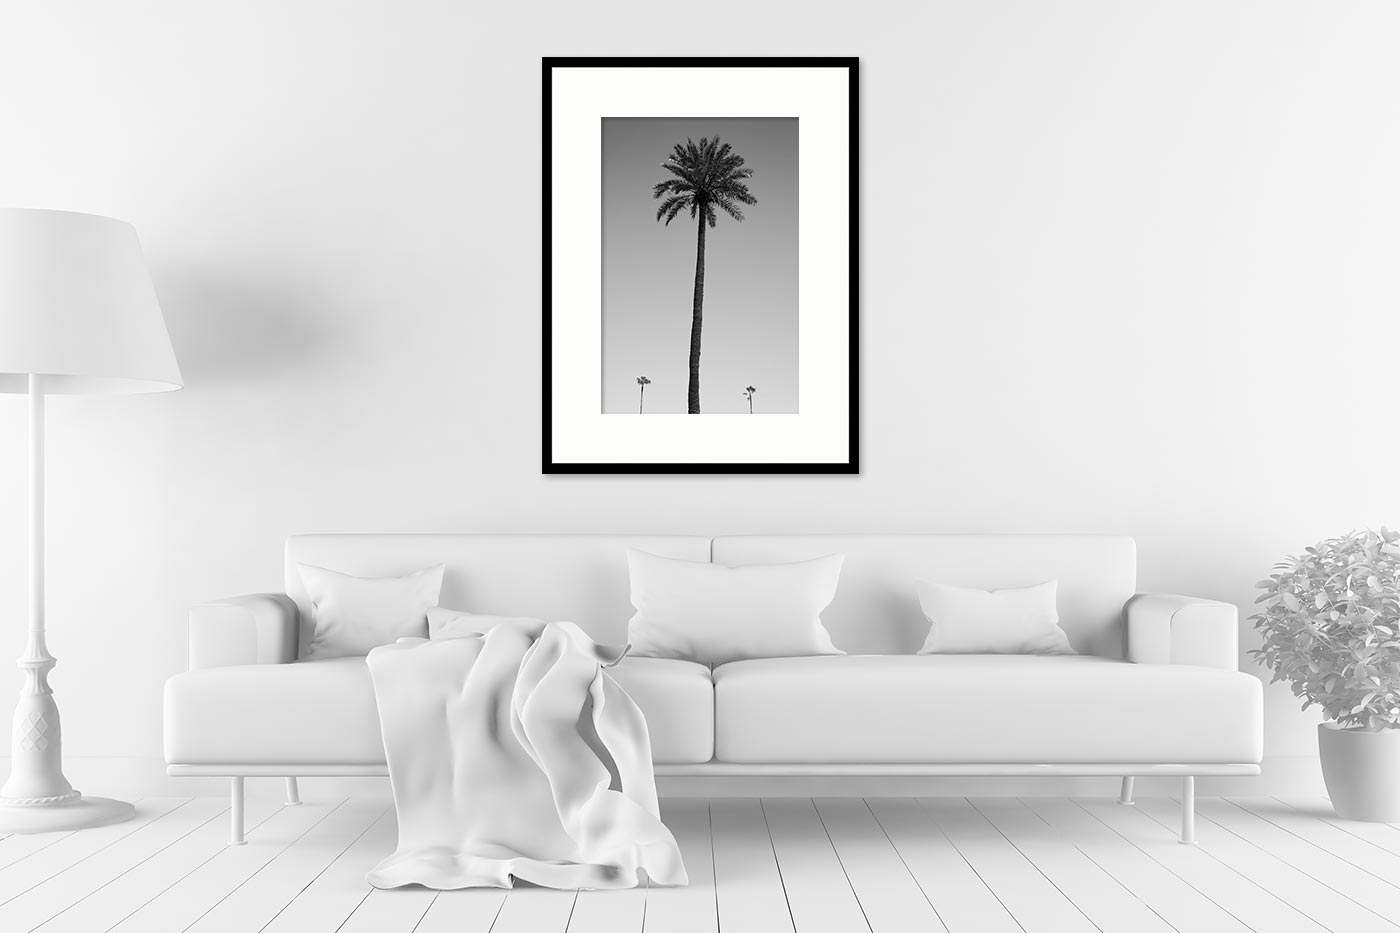 Cadre galerie 60x80 Three palm trees